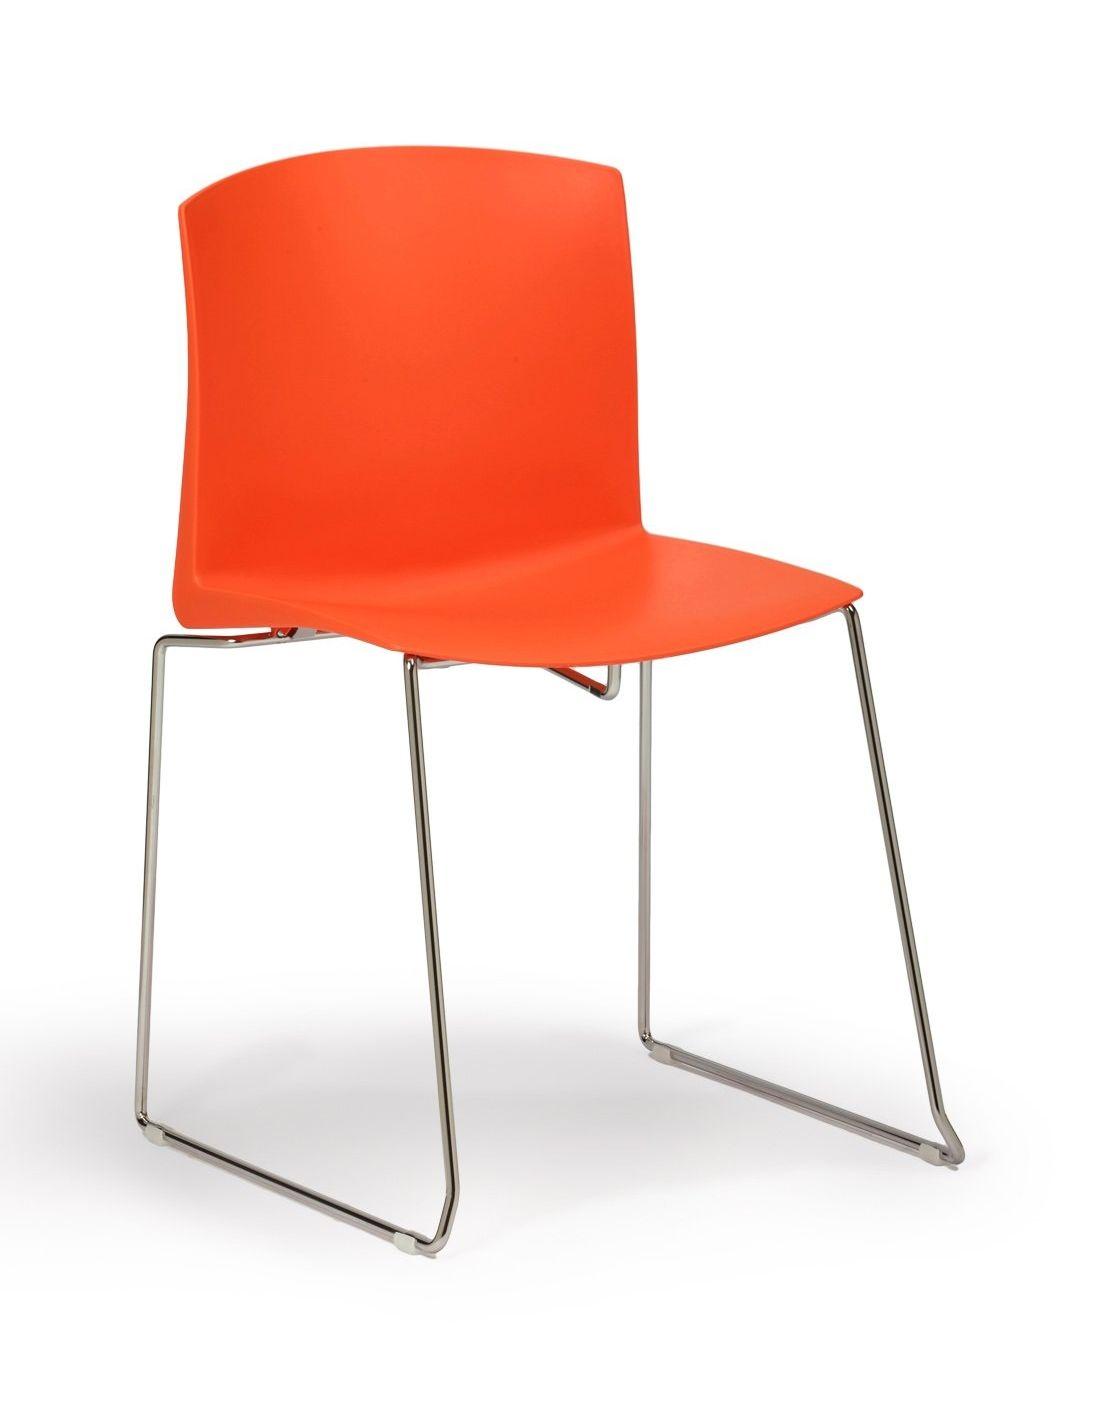 Sedie design economiche best sedia economica in ecopelle for Sedie ufficio design economiche